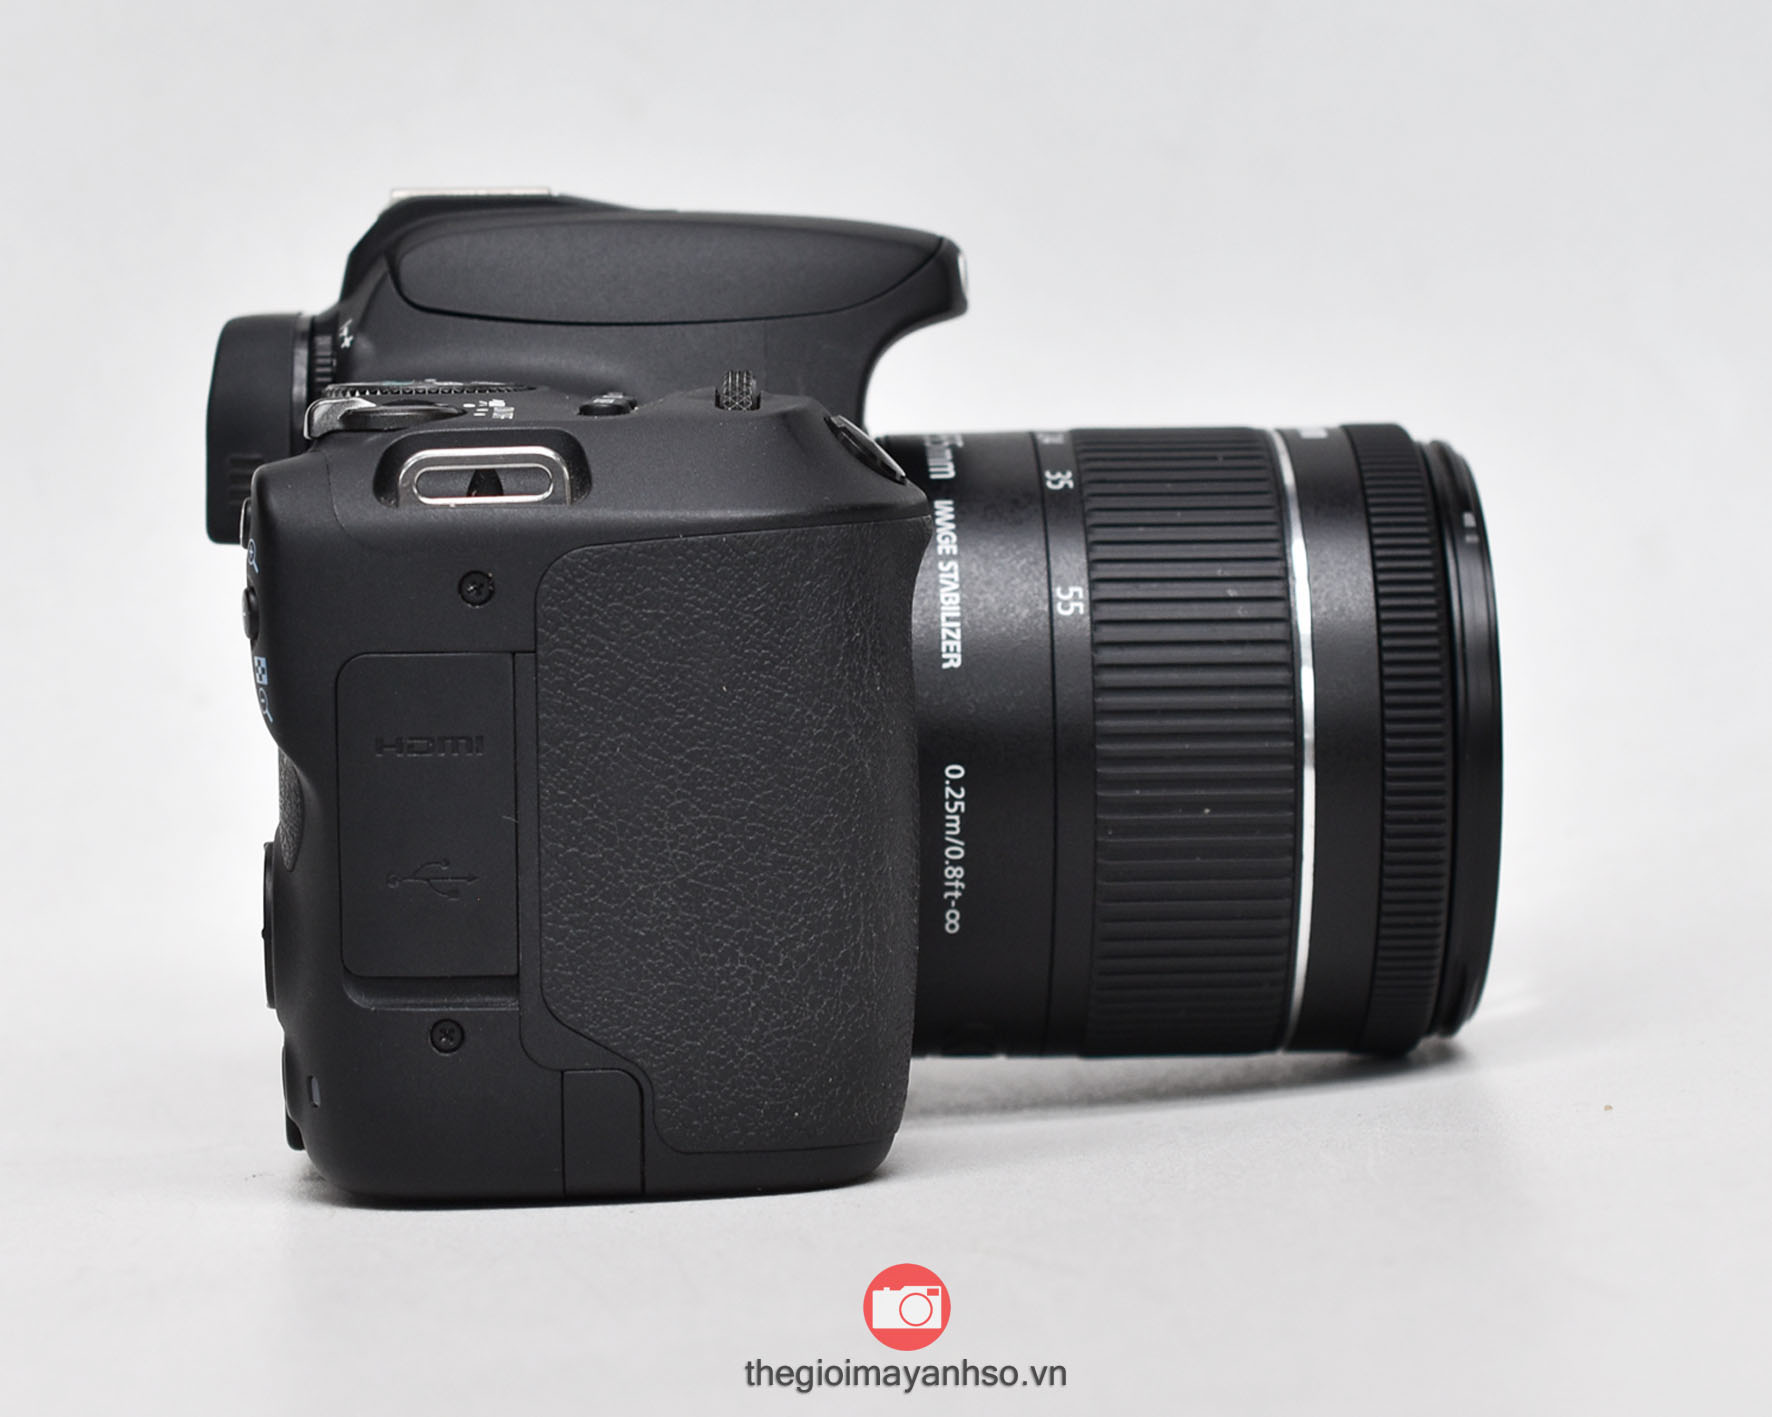 Canon EOS 200D / Kiss X9 kit 18-55mm f4-5.6 STM